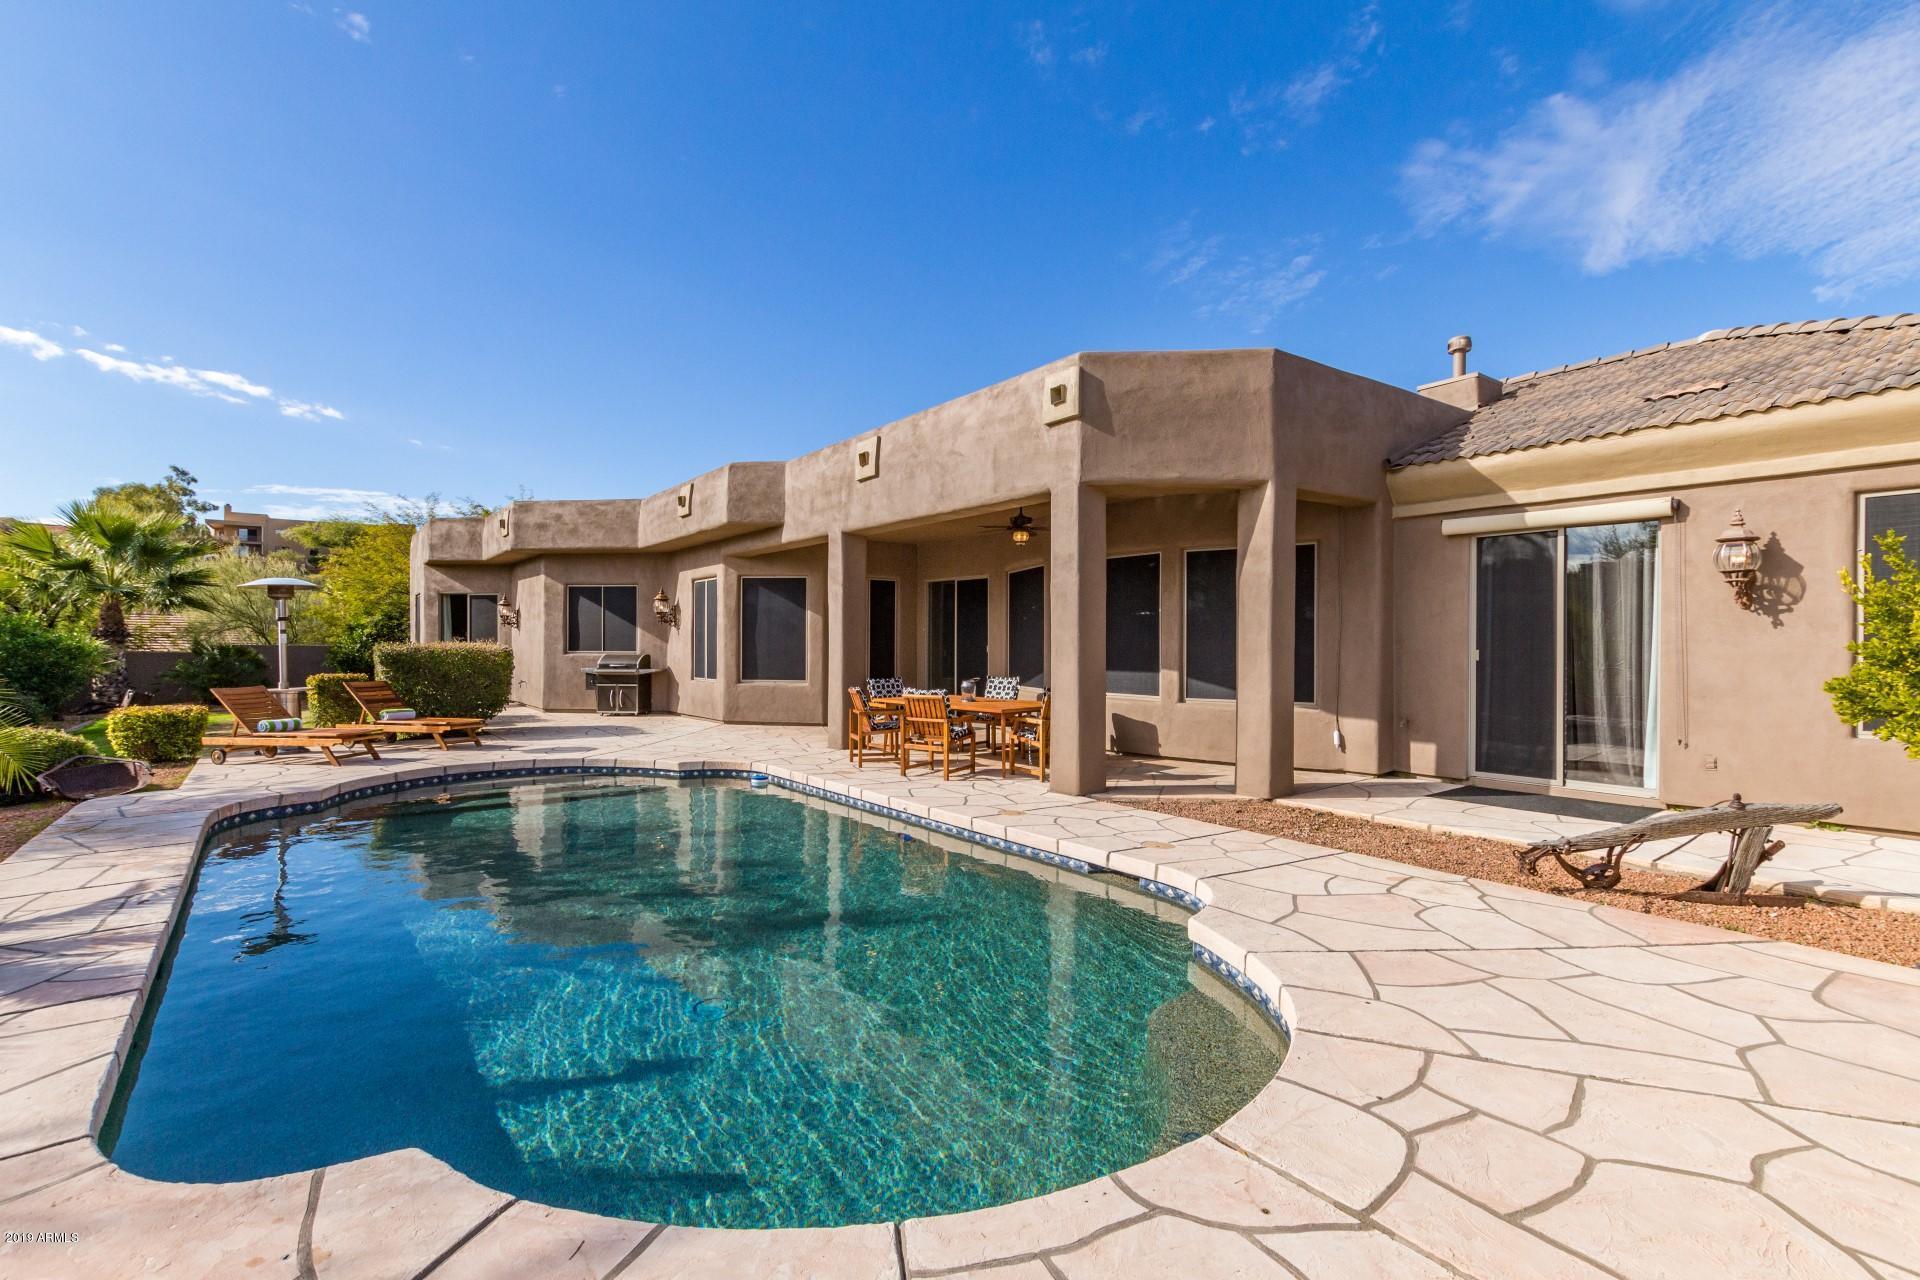 Photo of 15837 E KIPLING Drive, Fountain Hills, AZ 85268